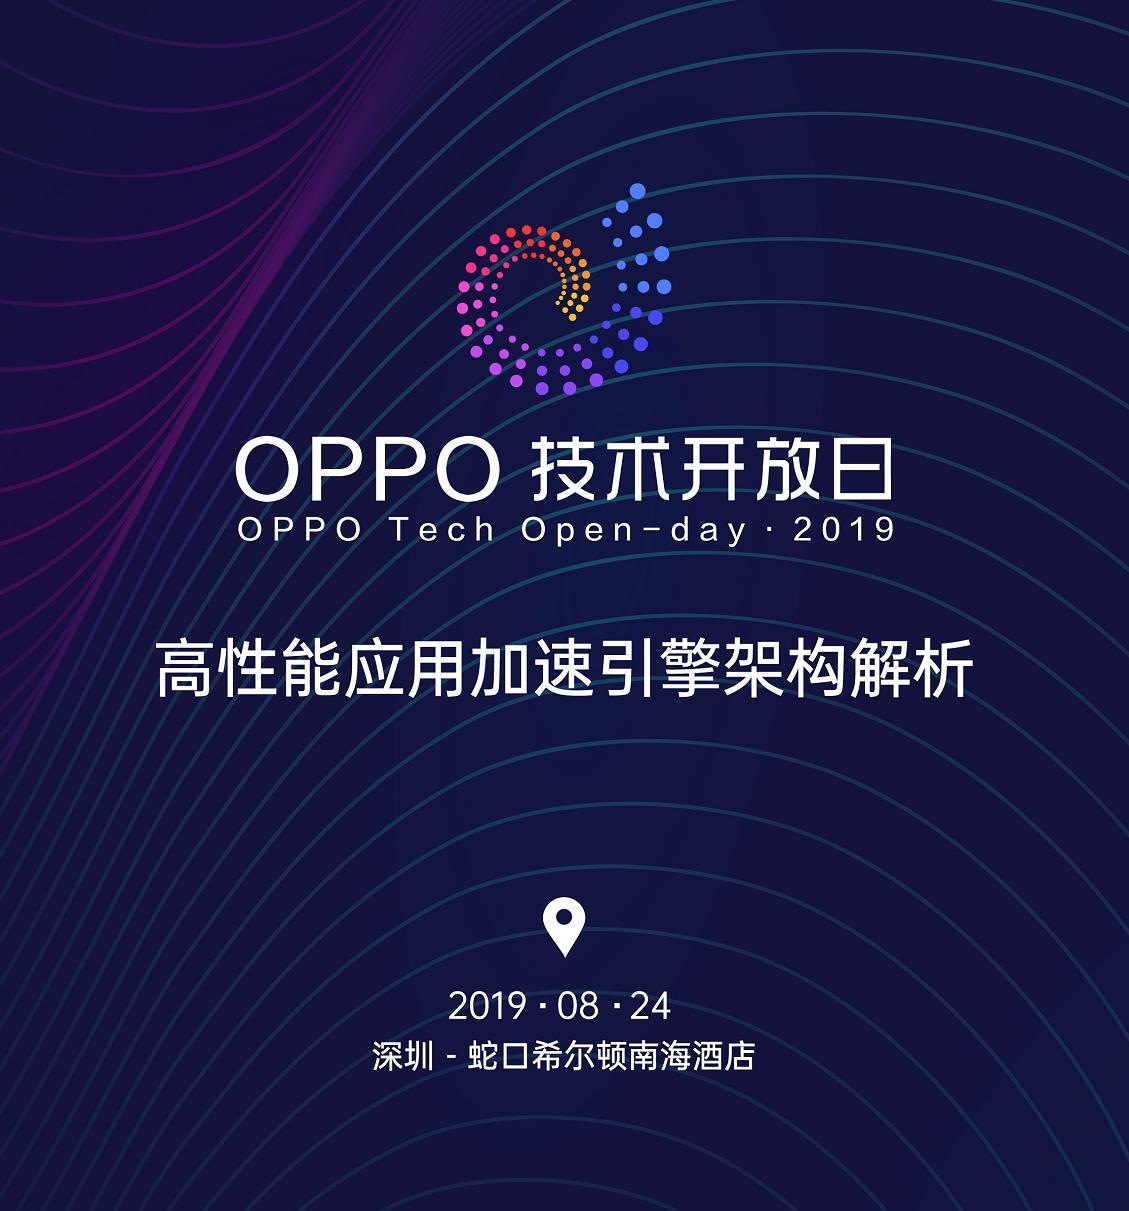 "OPPO開放平臺即將揭幕""黑科技"",OPPO技術開放日第四期來襲!"